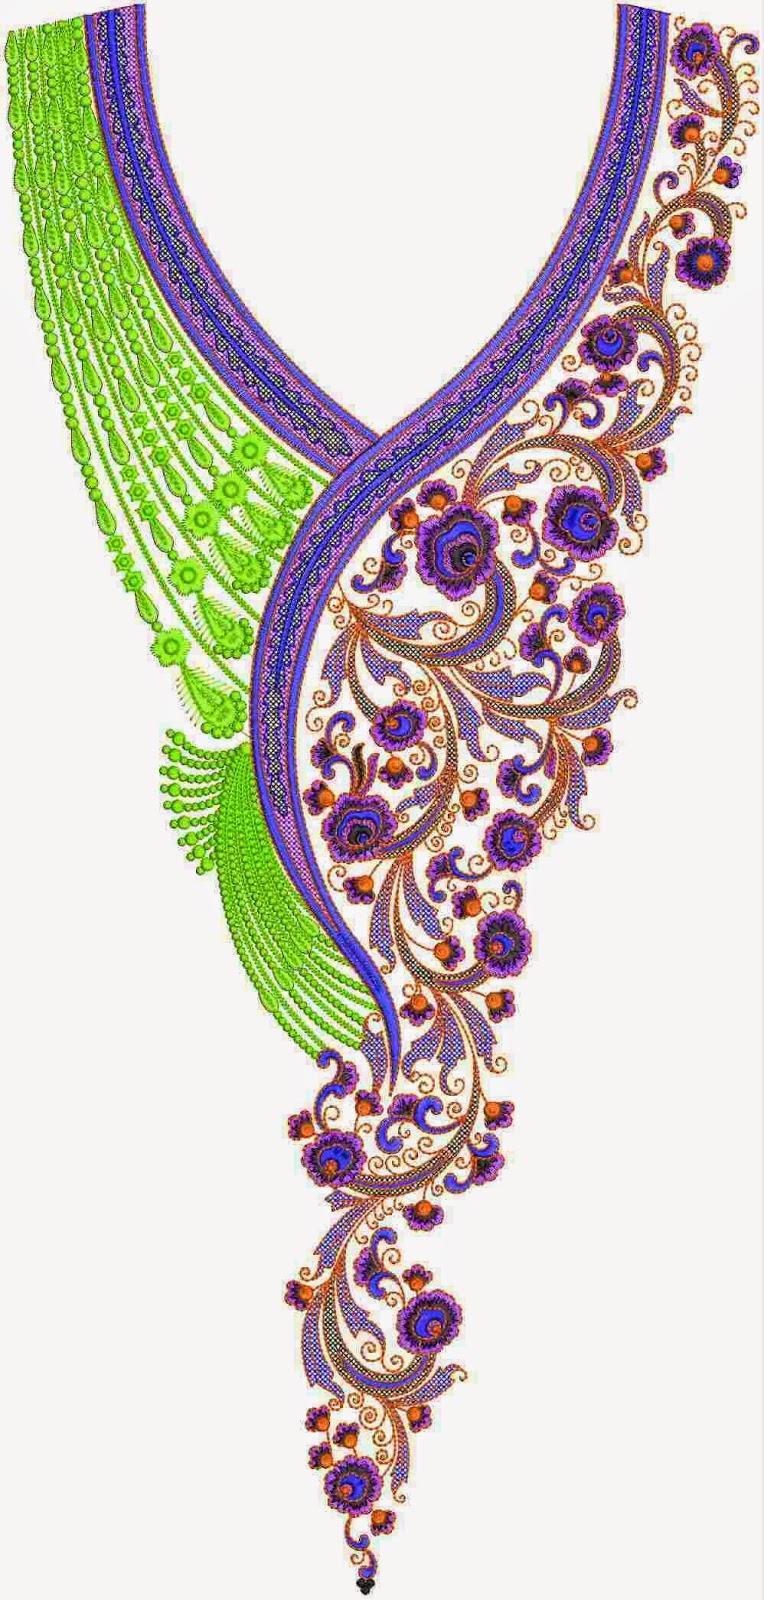 Pakistani Dress Embroidery Lovely Neck Designs  Embdesigntube